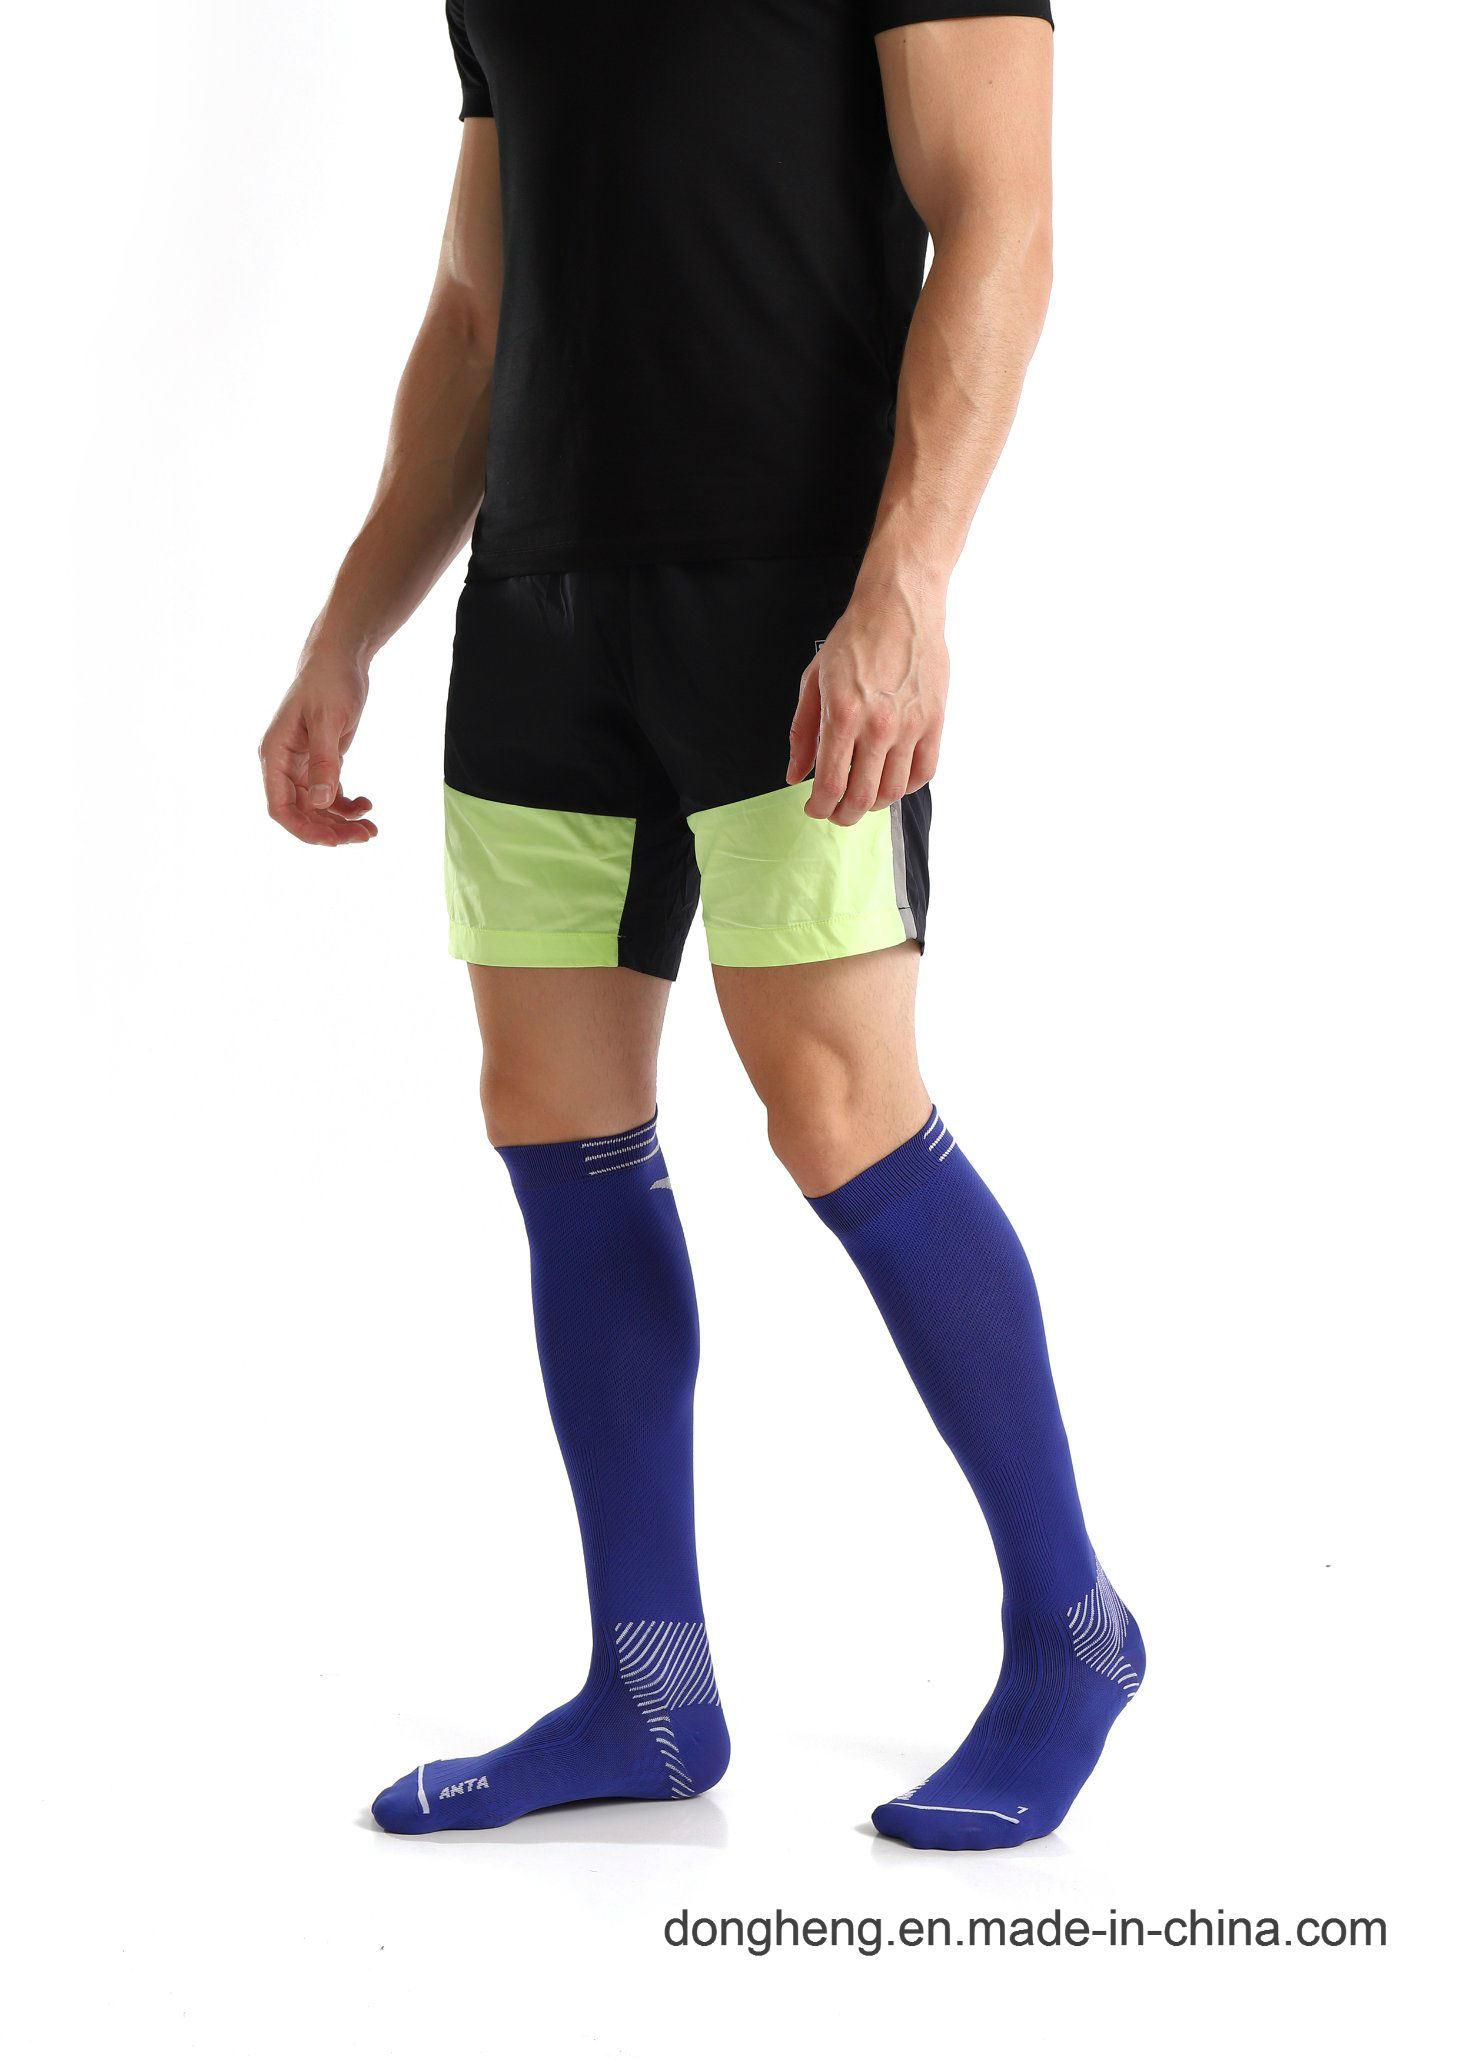 f01f98c8caa China Cotton Compression Graduated Support Knee-High Purple Jacquard Socks  for Men Women - China Cotton Compression Socks